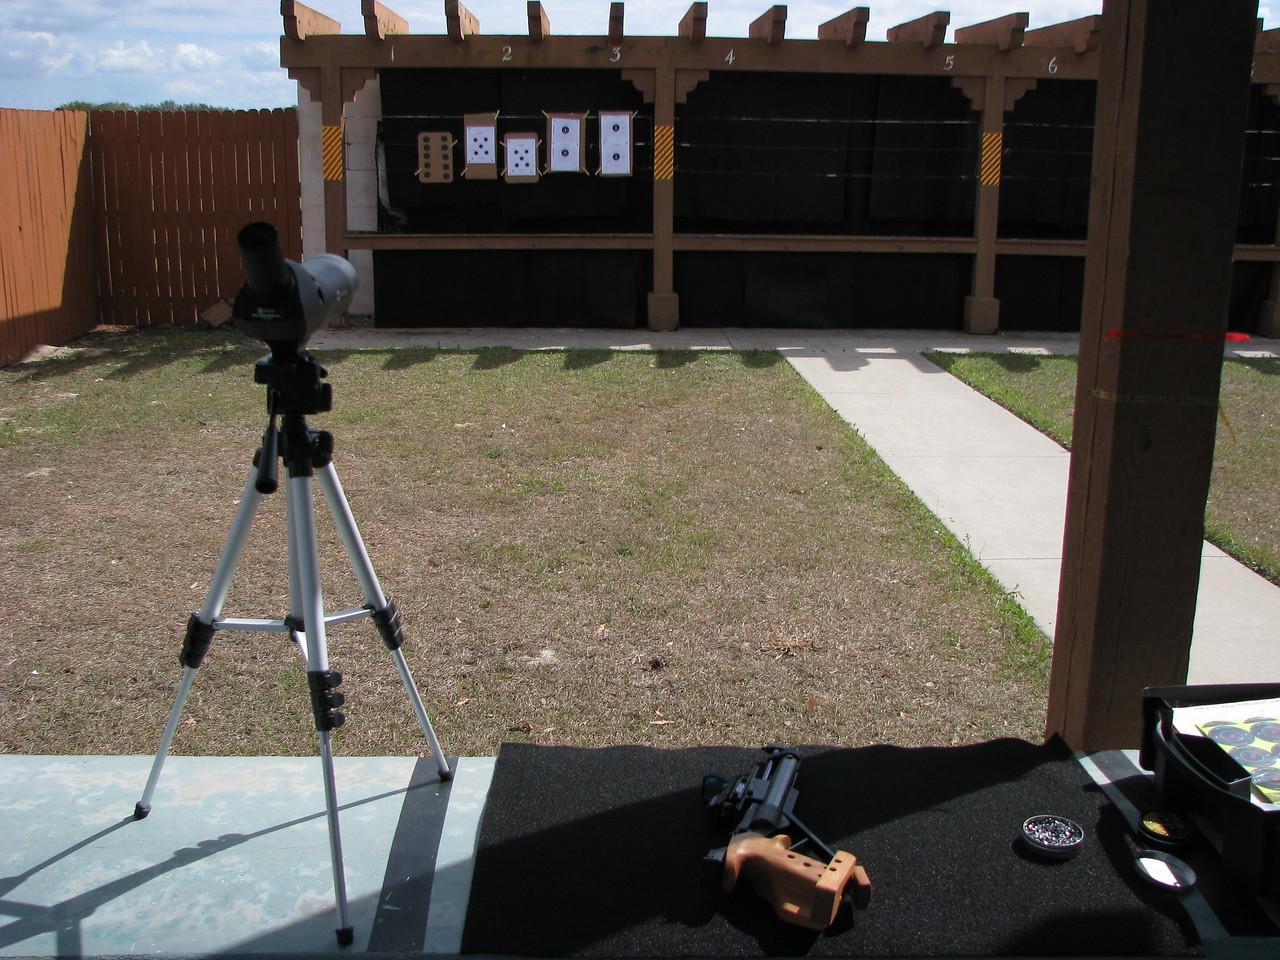 NRA certified, 10 meter, air gun range located in The Villages.